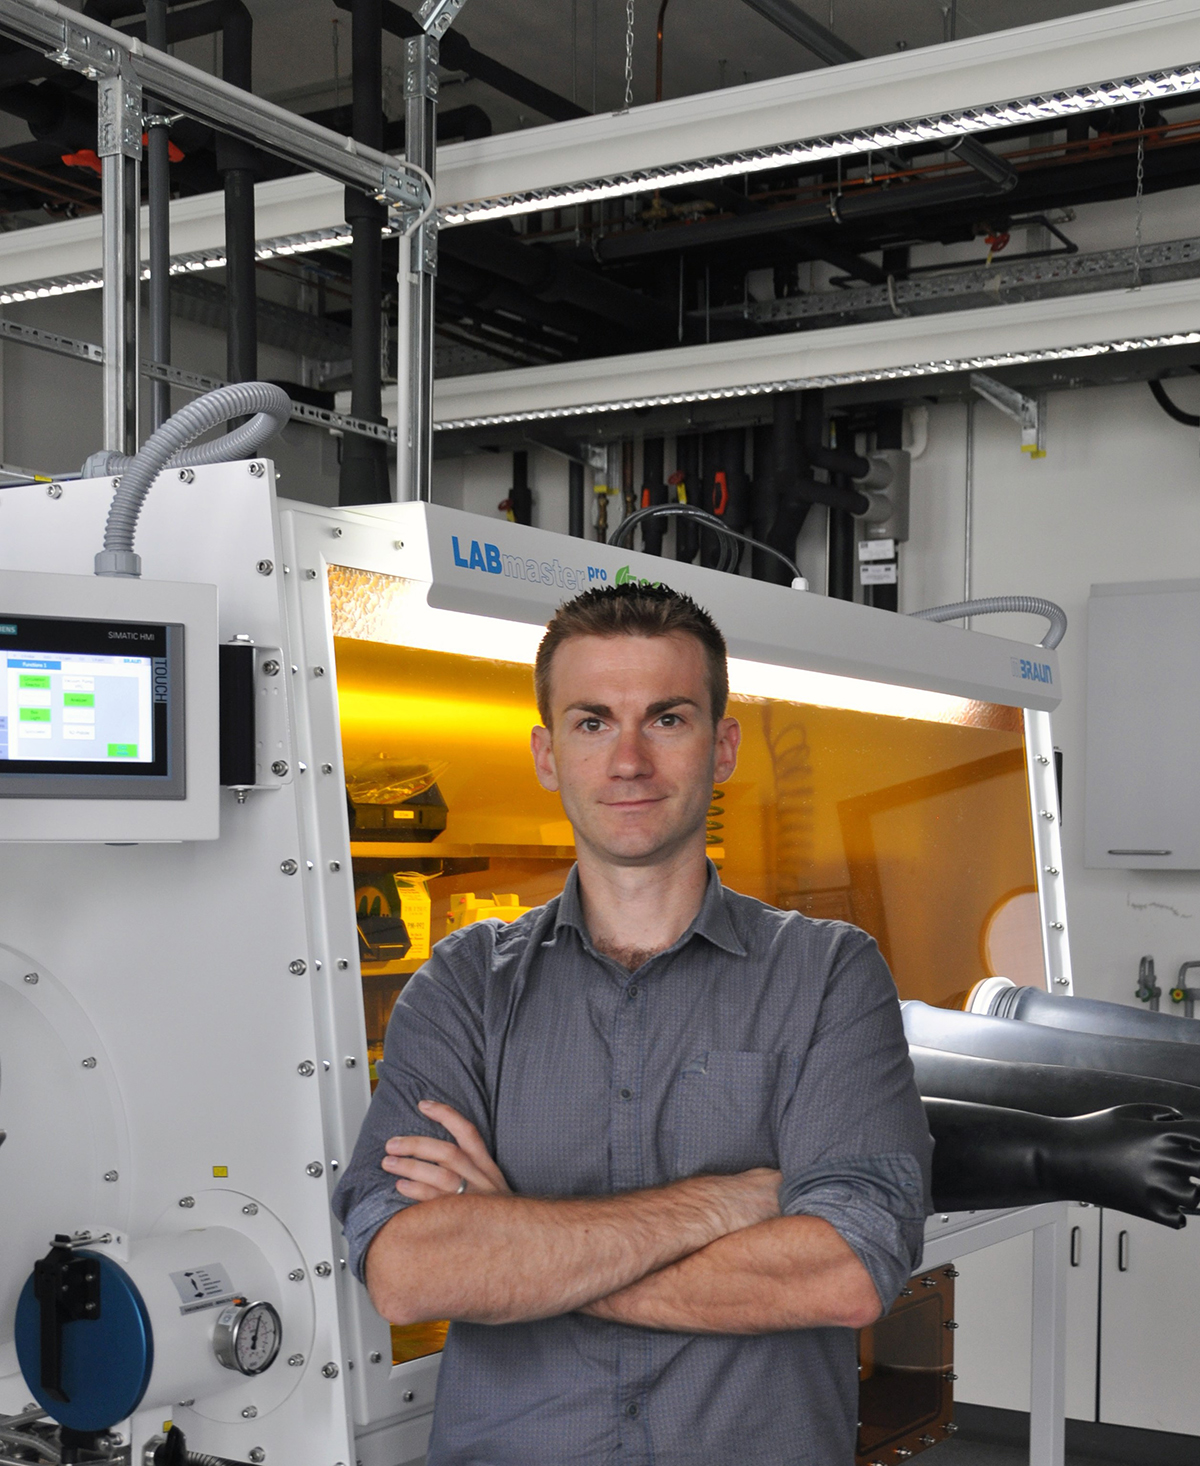 carbon nanotube, nanotechnology